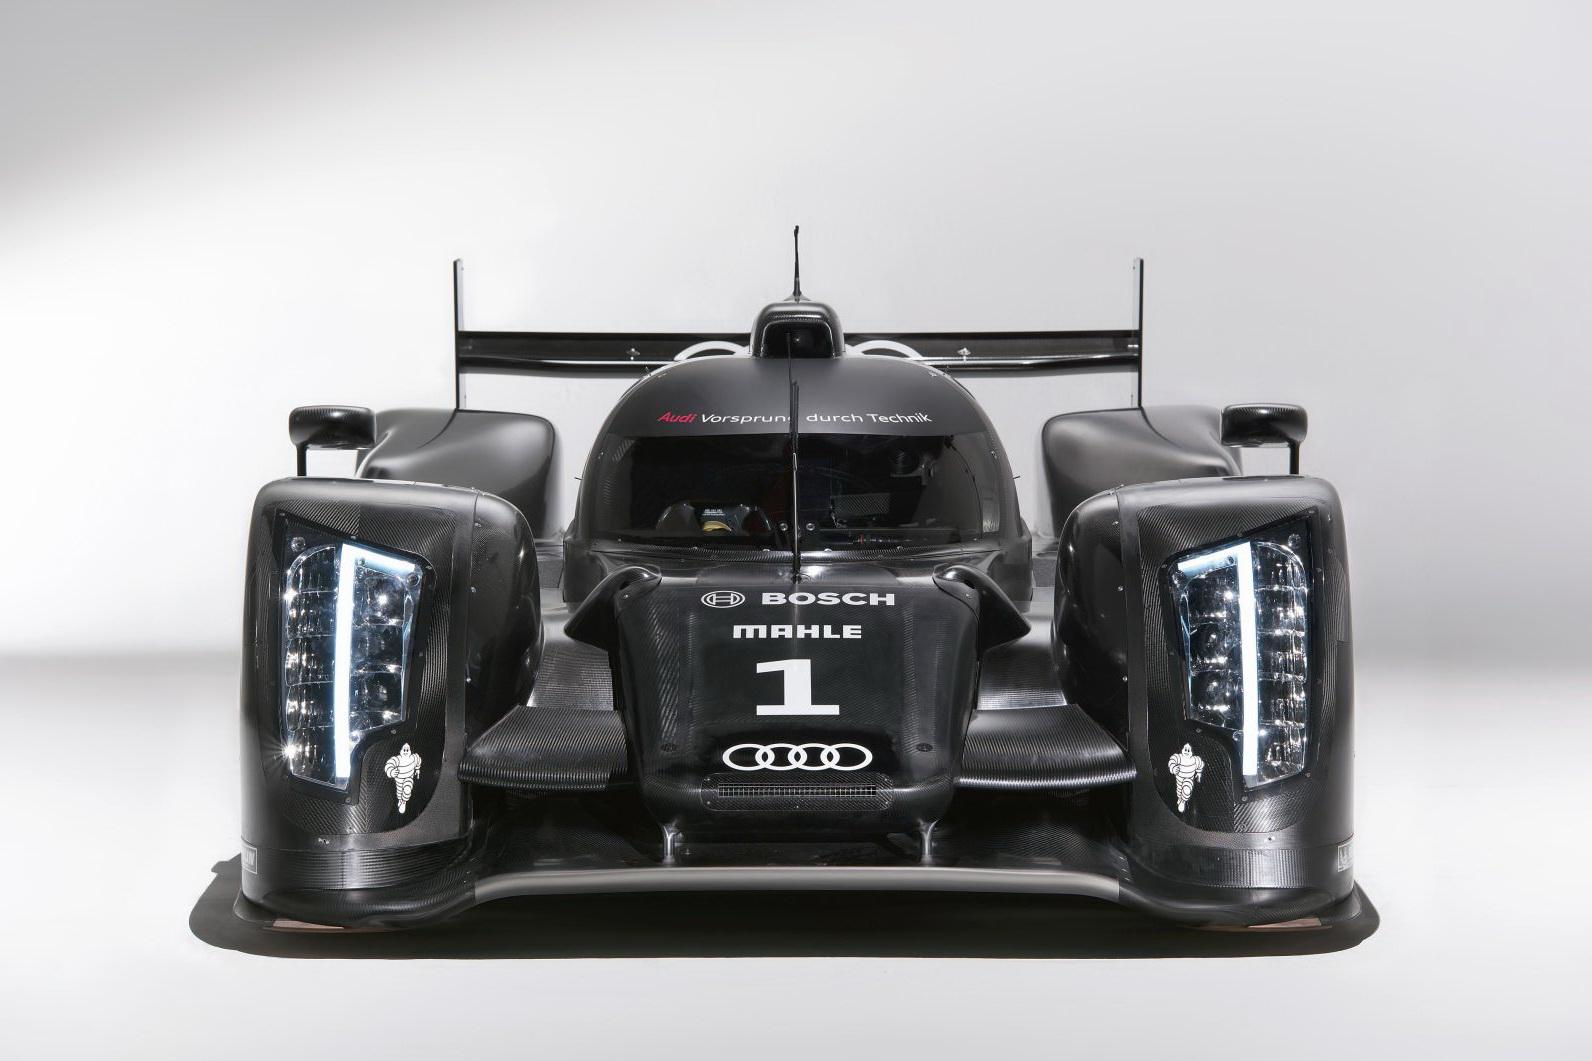 http://3.bp.blogspot.com/-CPCr0J6vkEo/Tq_LKJxxPmI/AAAAAAAAE3k/h-4GD24WH5Y/s1600/2011-Audi-R18-TDI-Racer-1%252Ba4.JPG